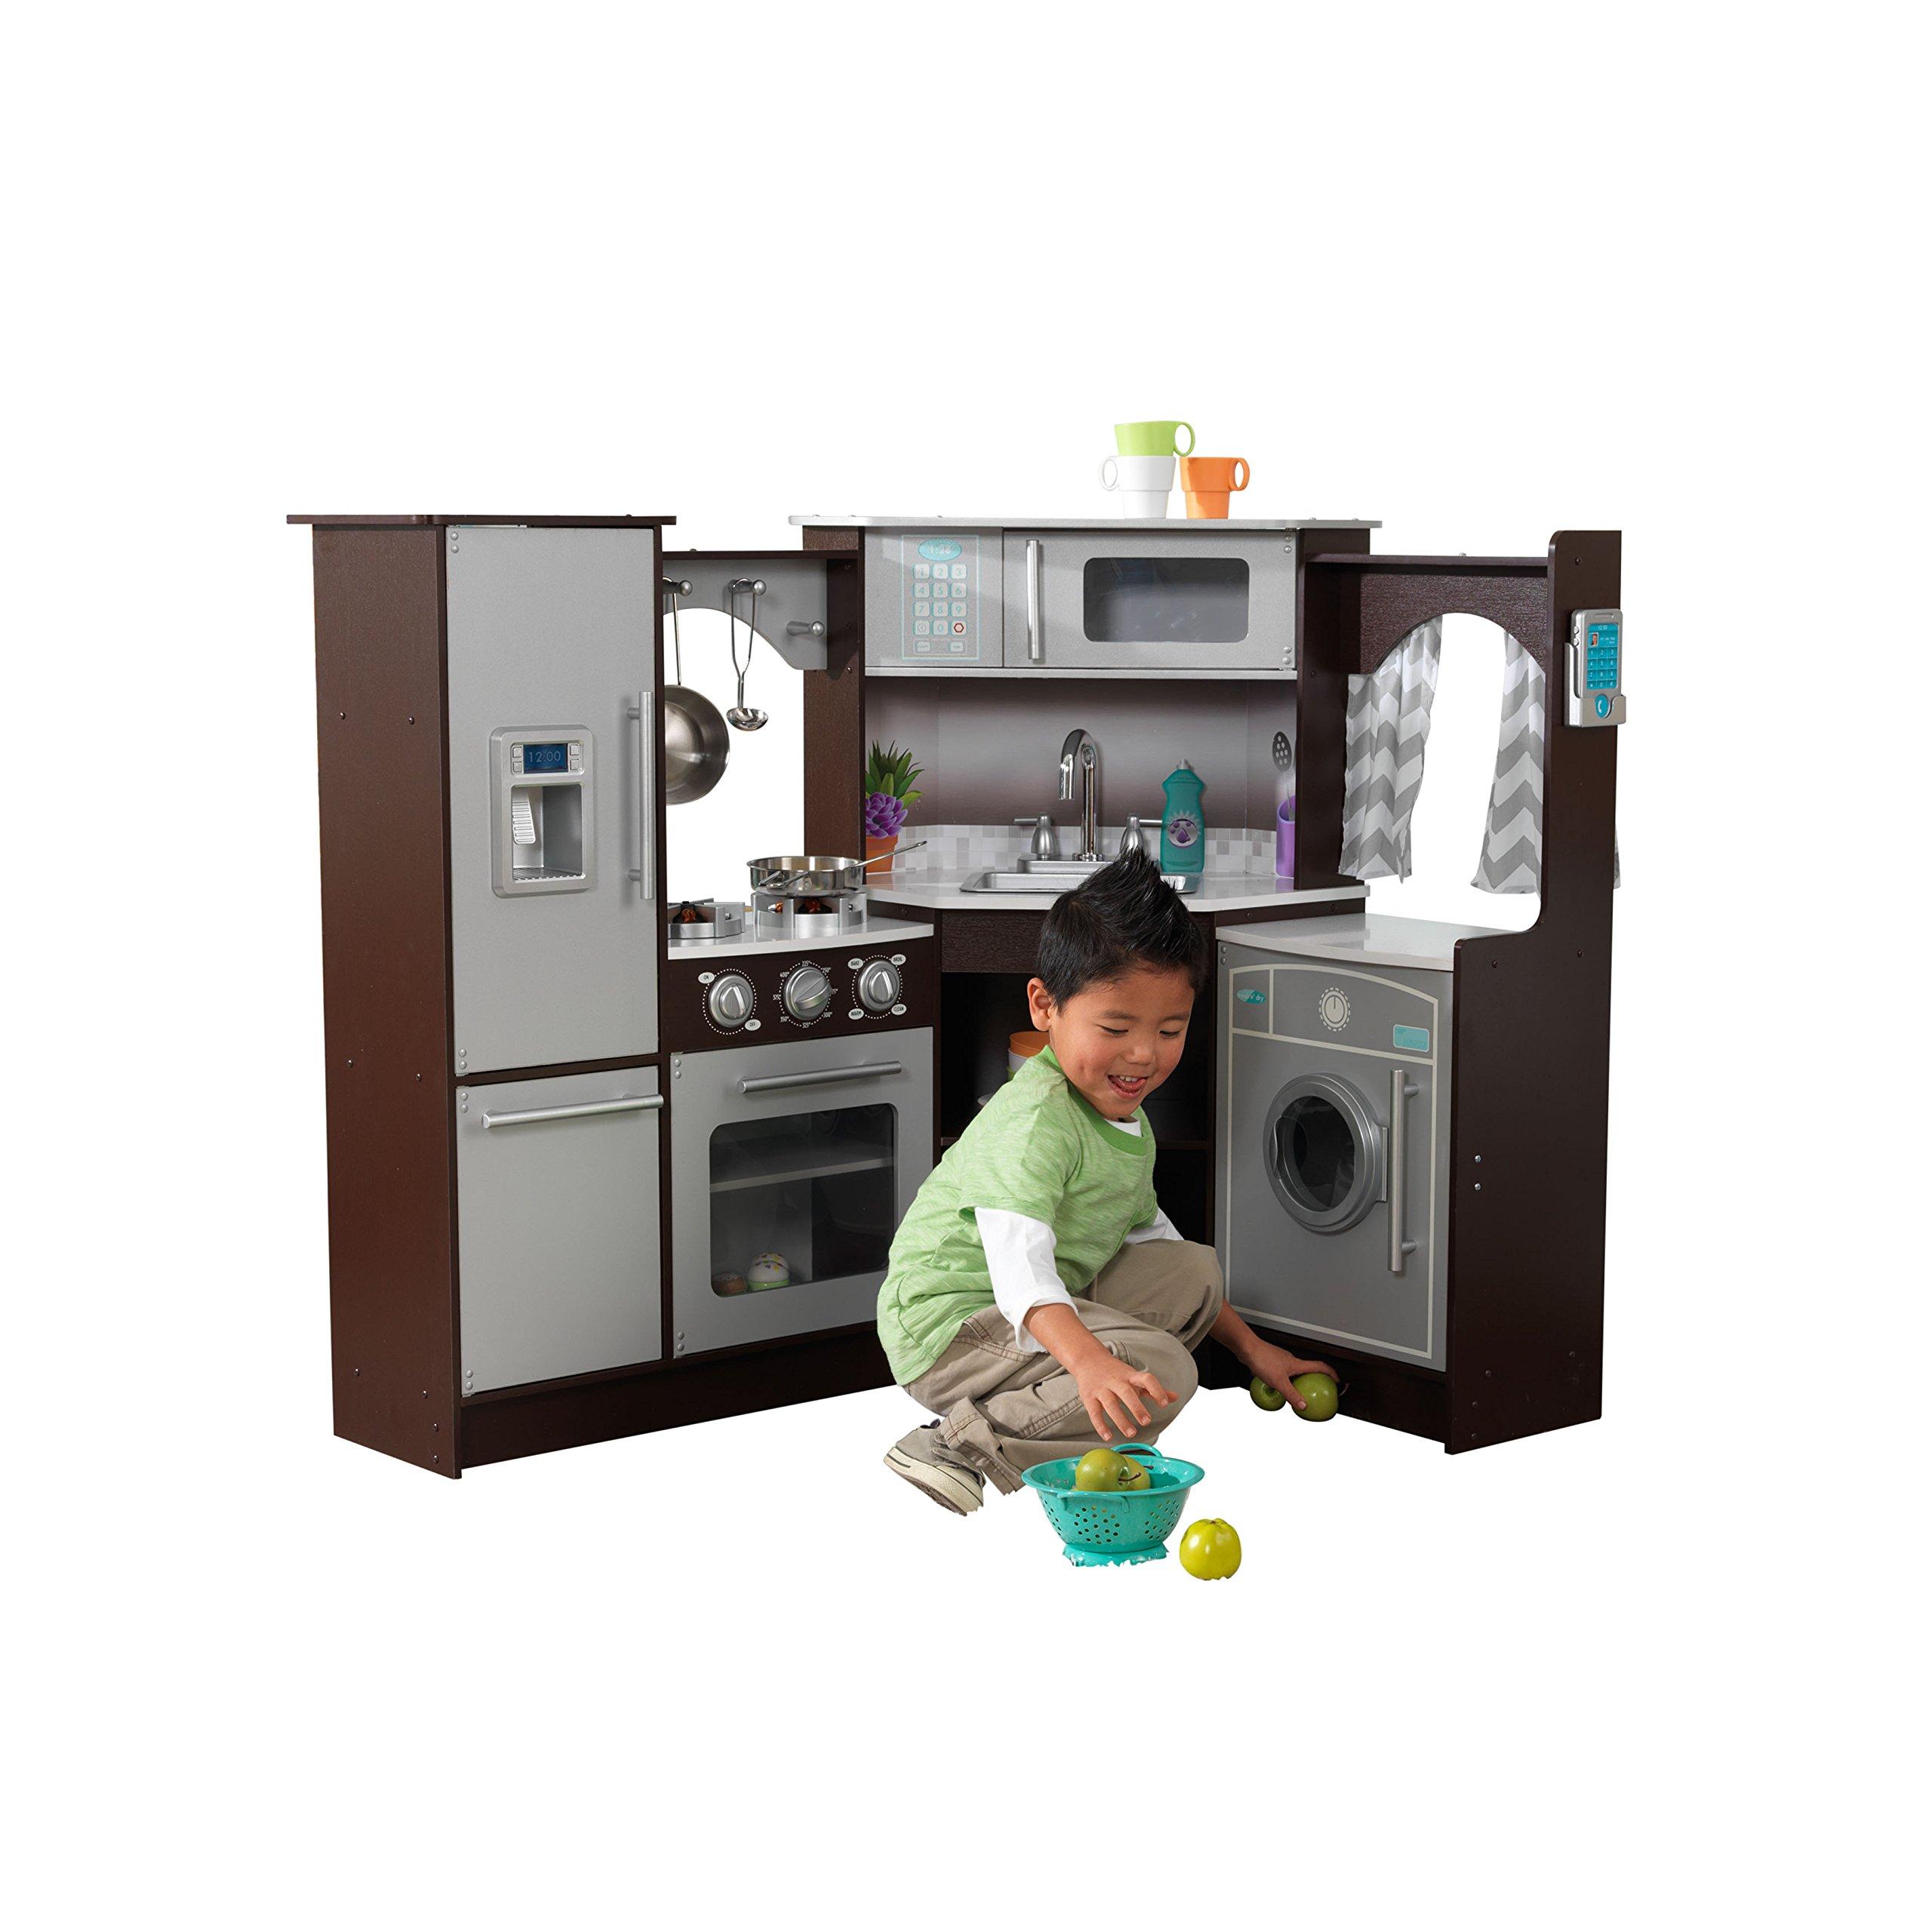 KidKraft Ultimate Corner Play Kitchen with Lights & Sounds, Espresso by KidKraft